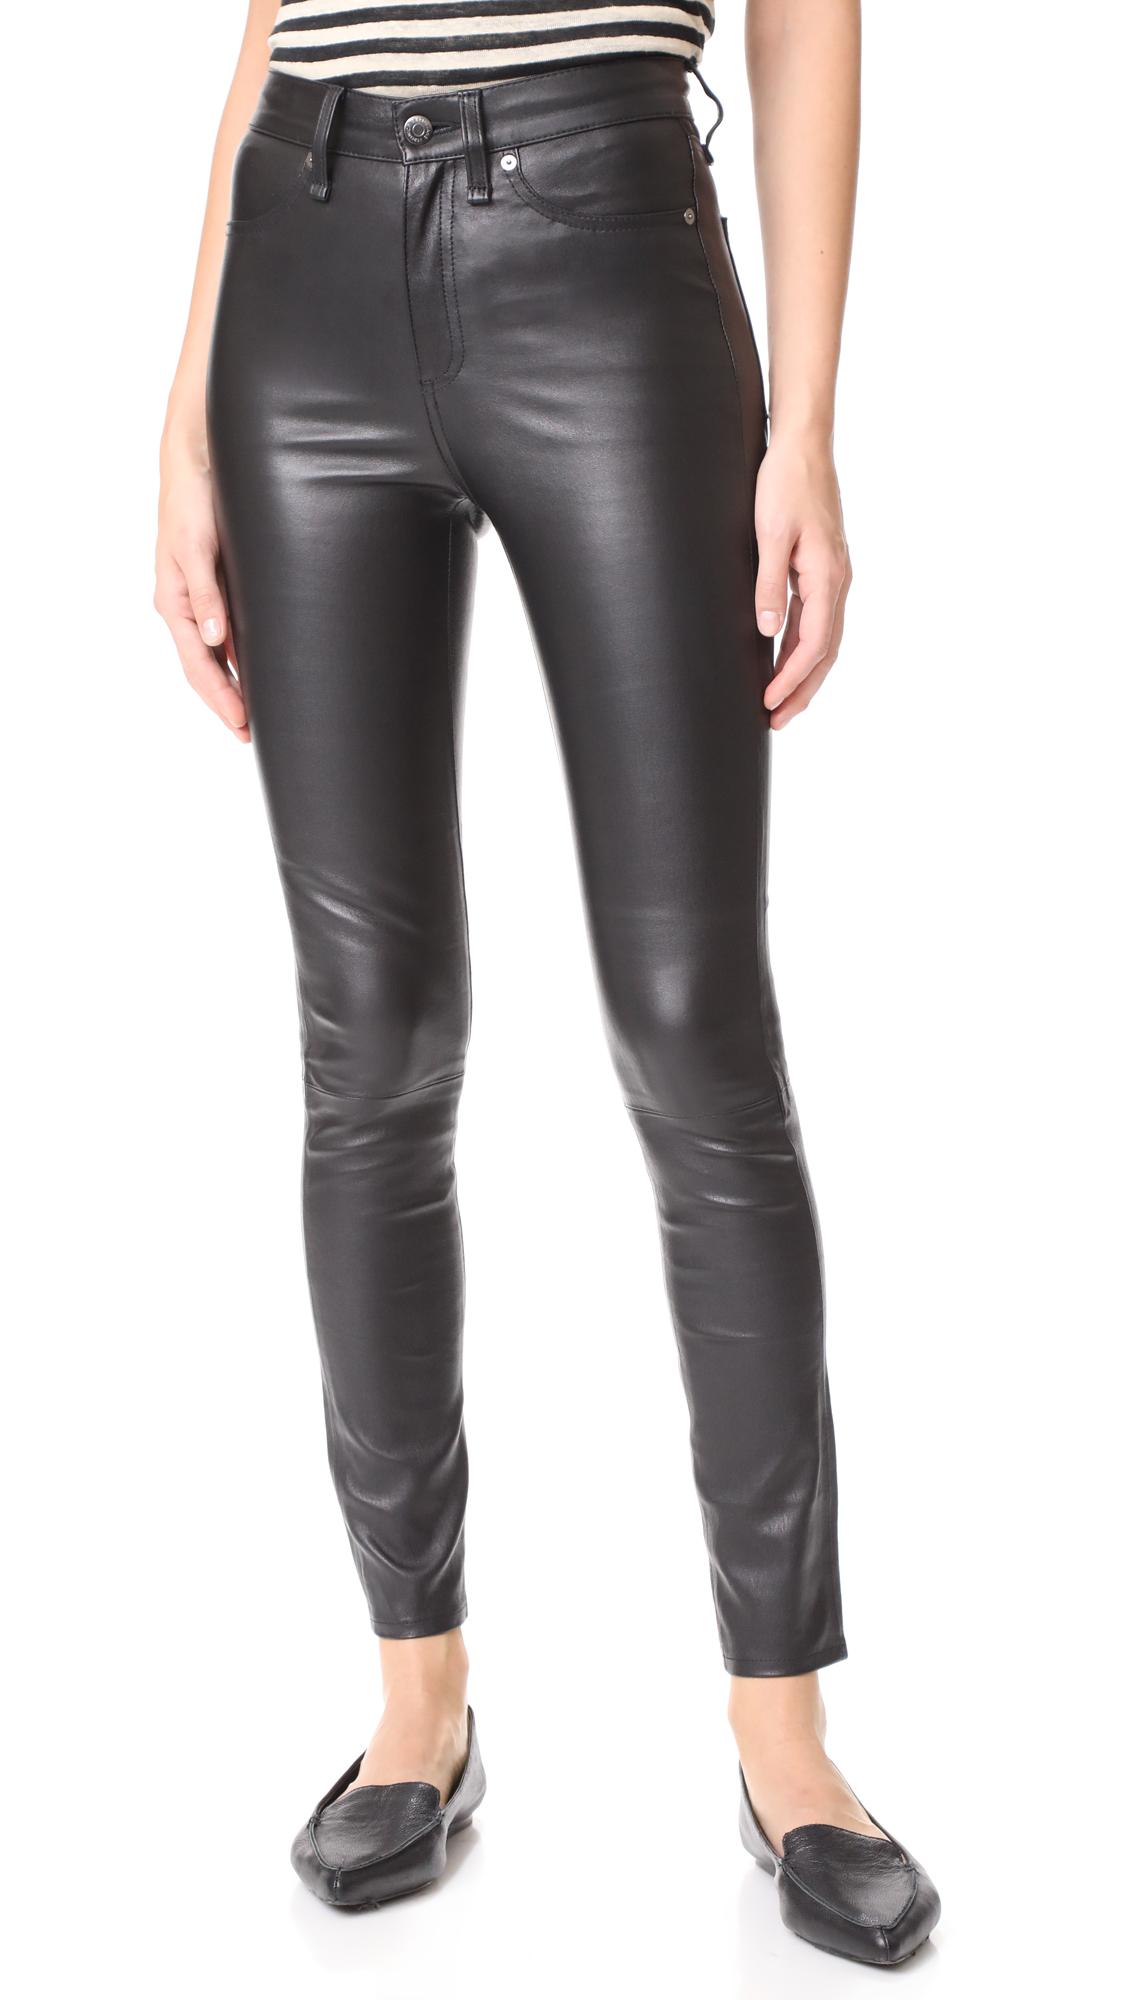 Veronica Beard Jean Kate Leather Skinny Jeans - Black